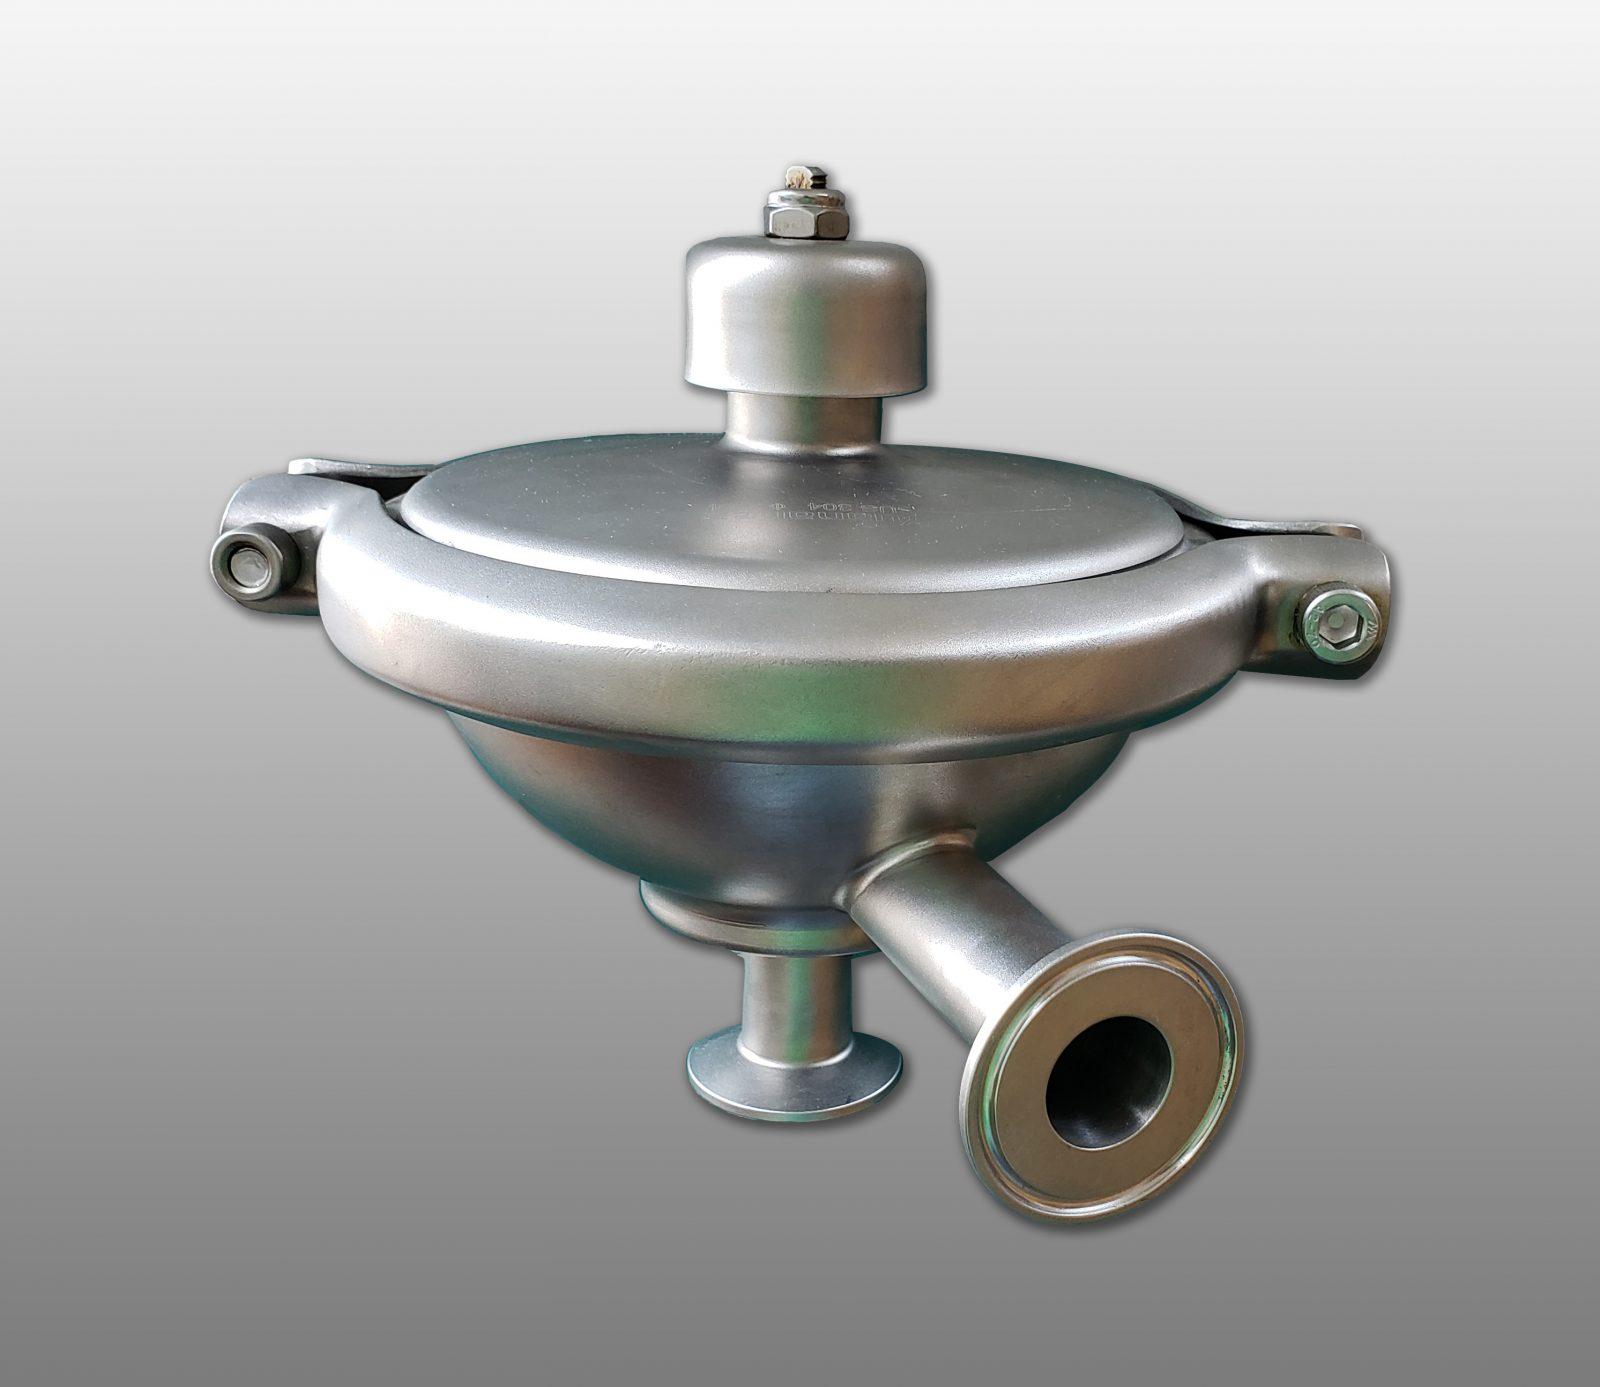 Stainless Steel Constant Pressure Valve